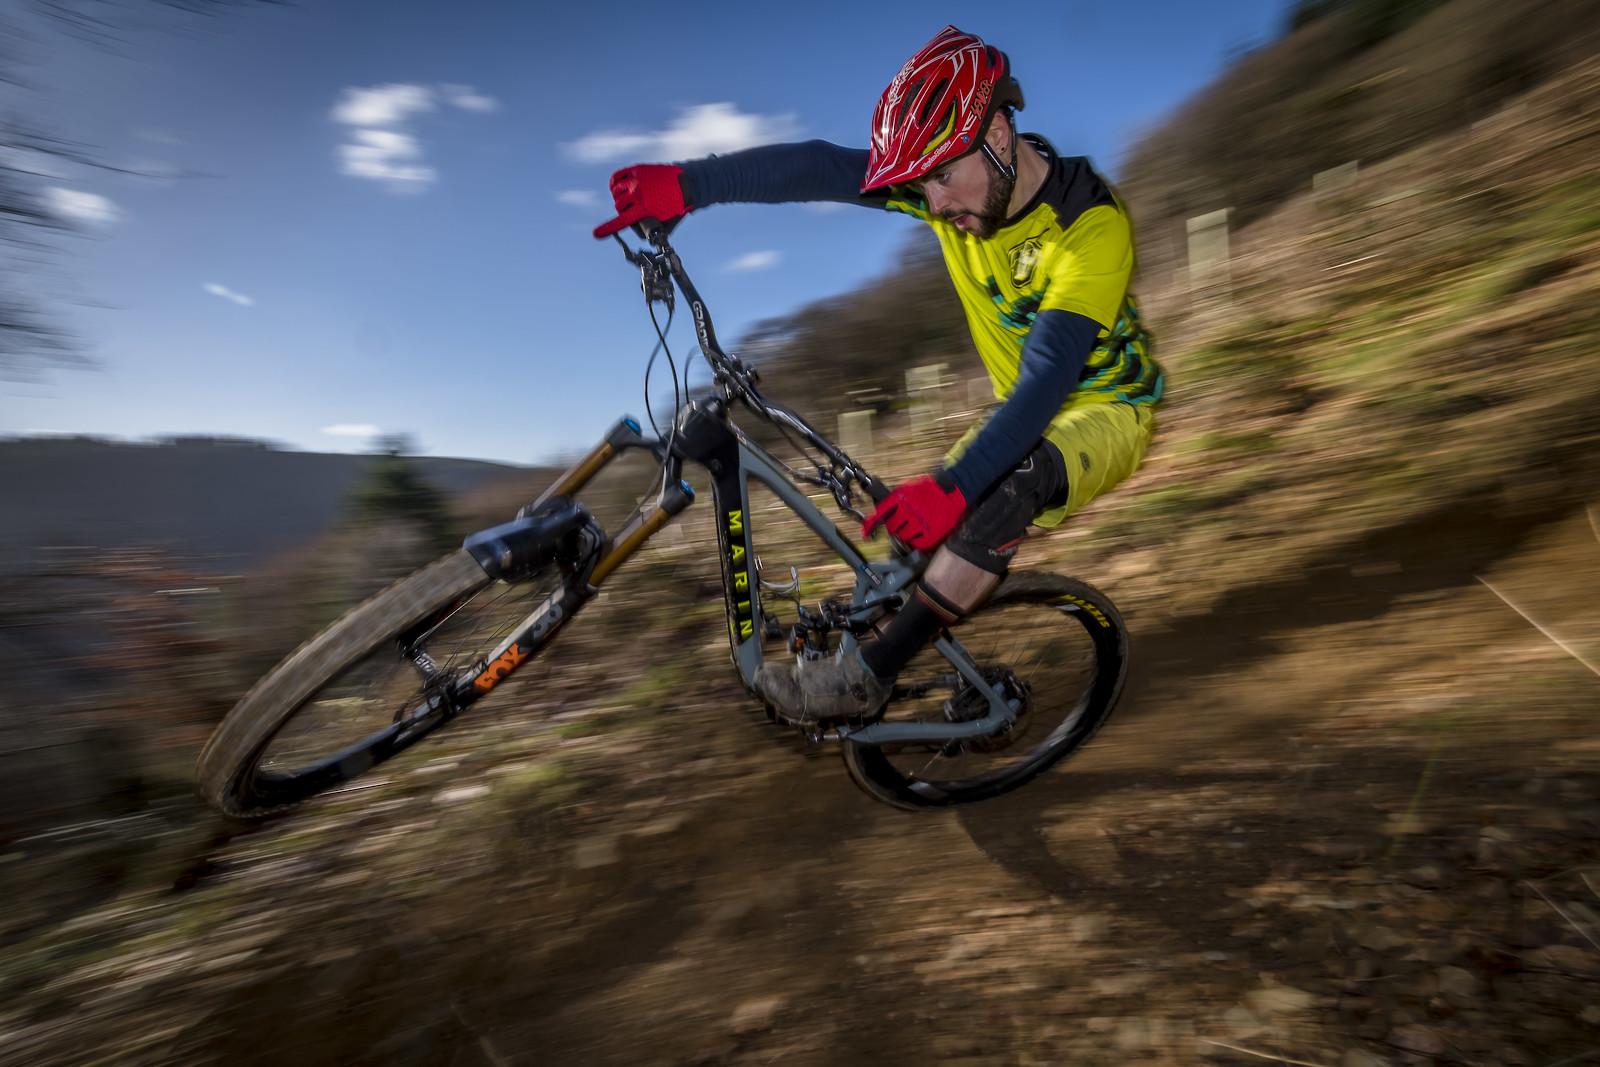 DSC0277 - robbarkerimages2017 - Mountain Biking Pictures - Vital MTB